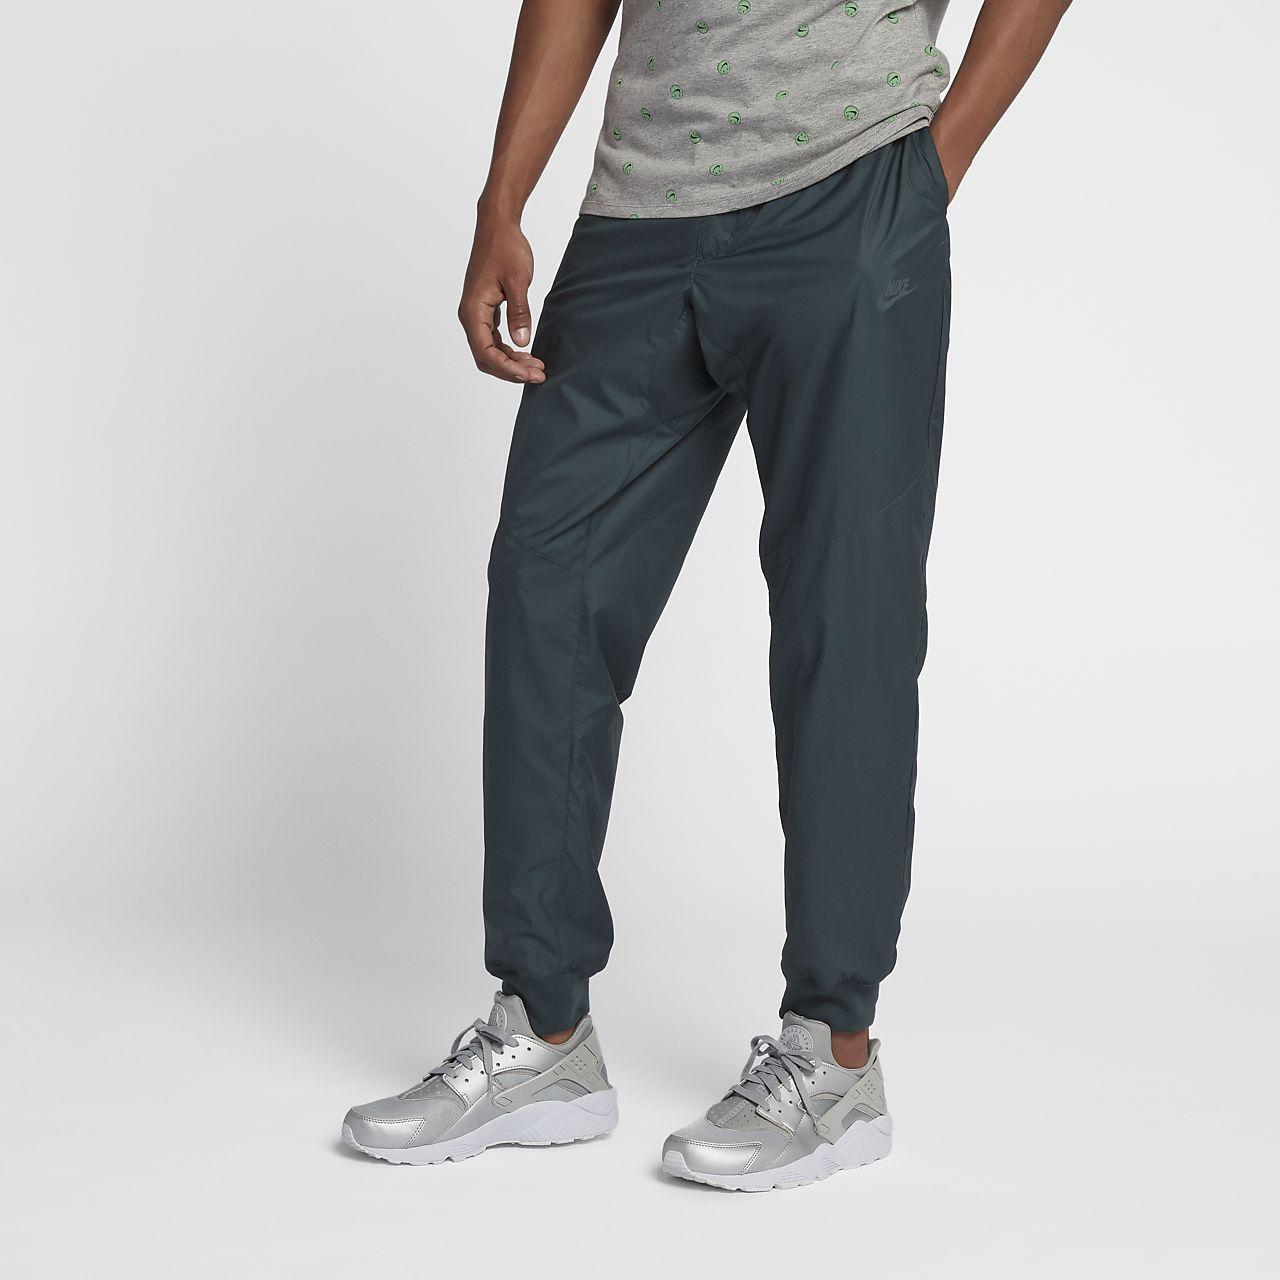 nike sportswear windrunner mens pants